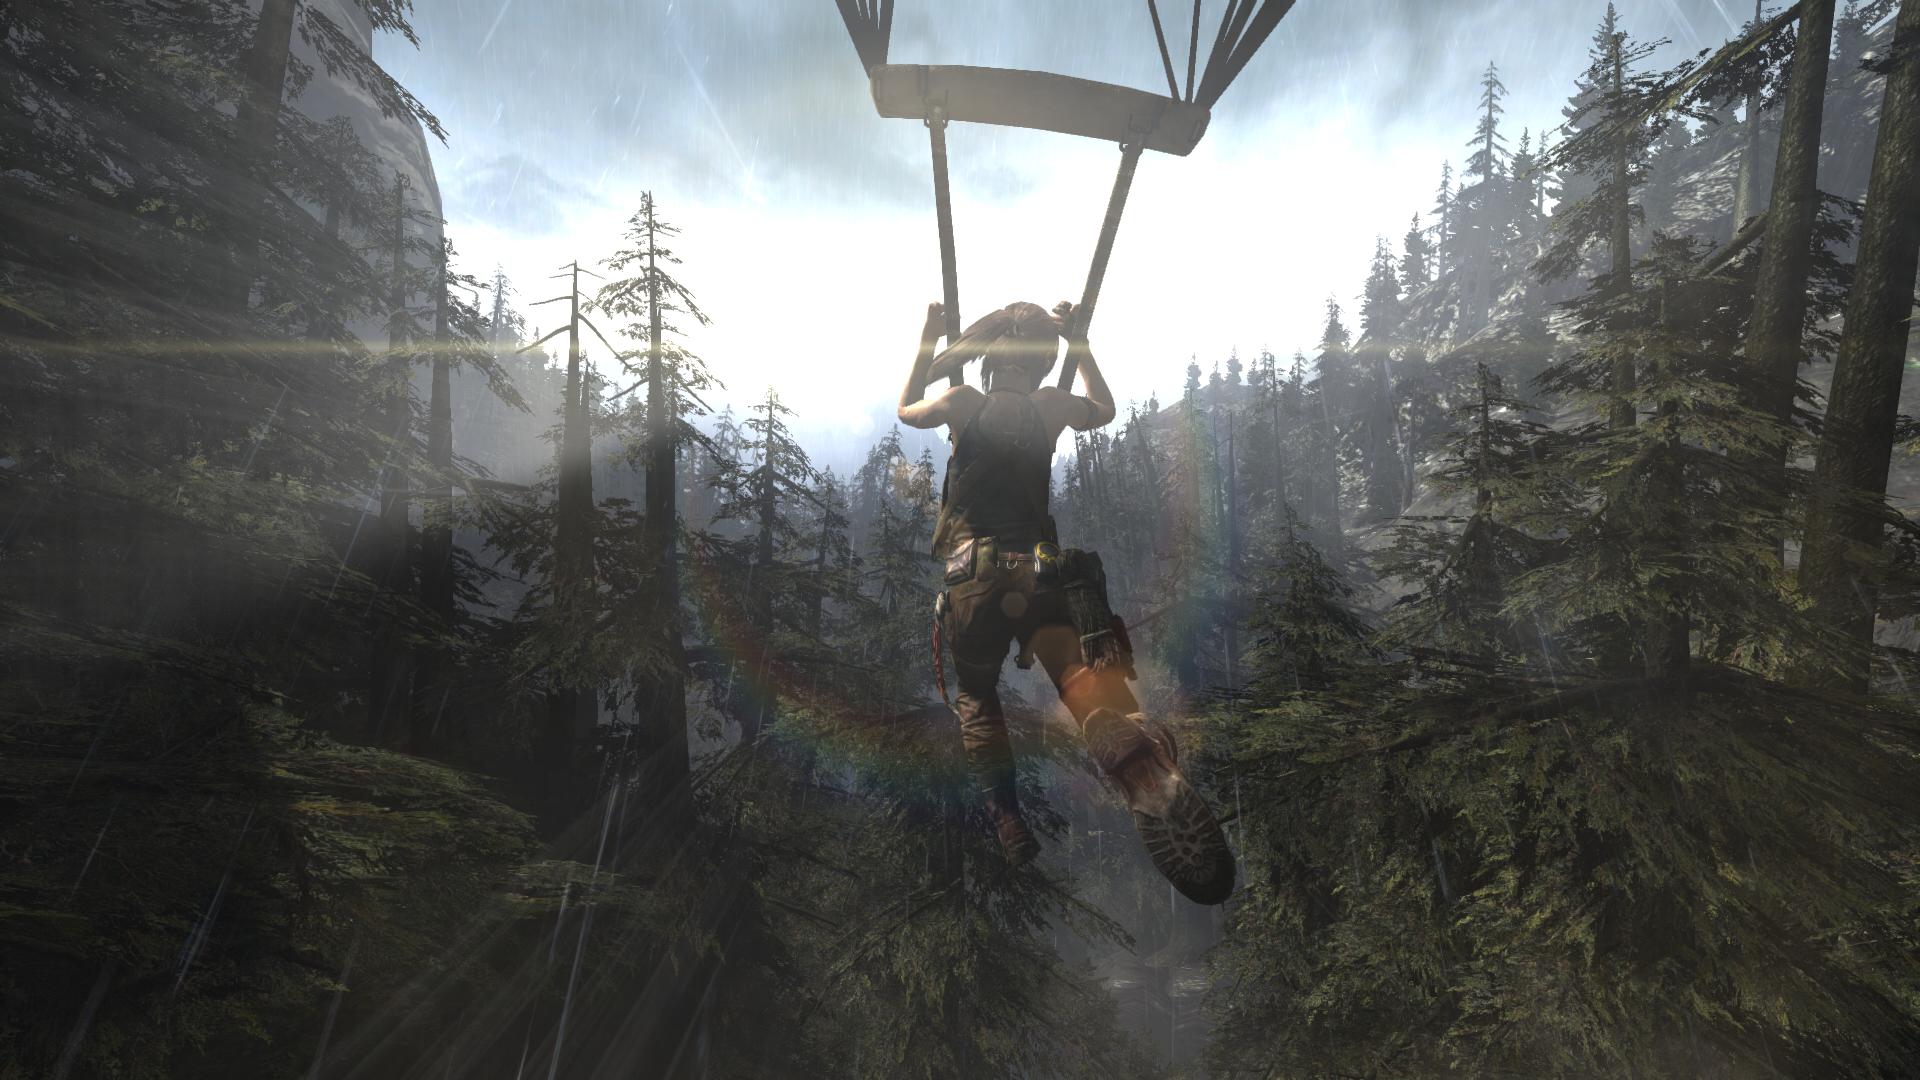 General 1920x1080 Lara Croft Tomb Raider (2013) tomb raider 2013 video games PC gaming screen shot